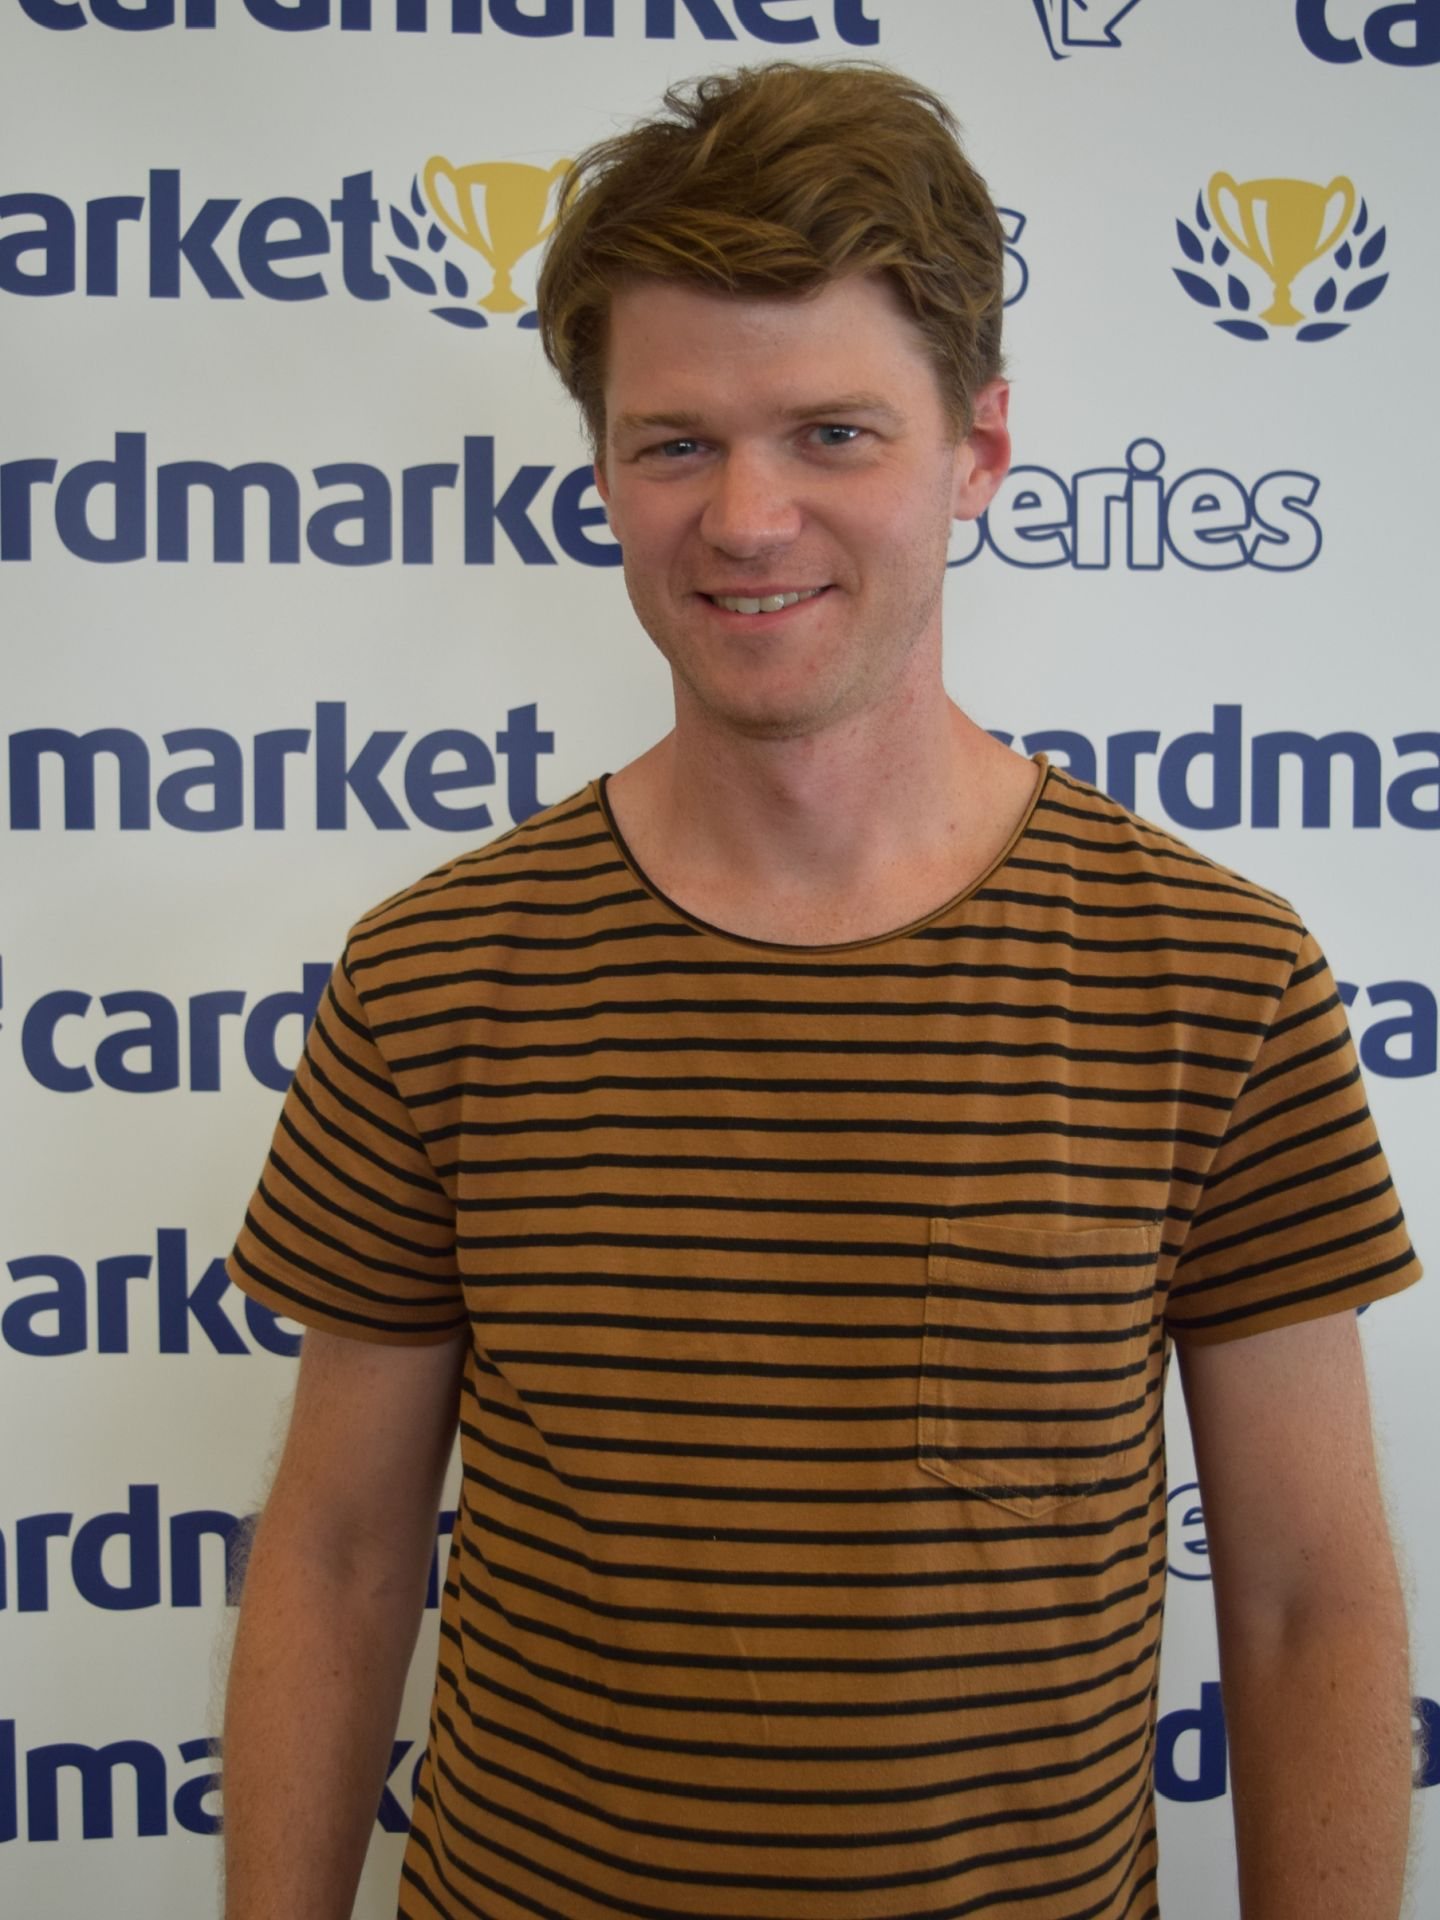 Linus Valdemarsson